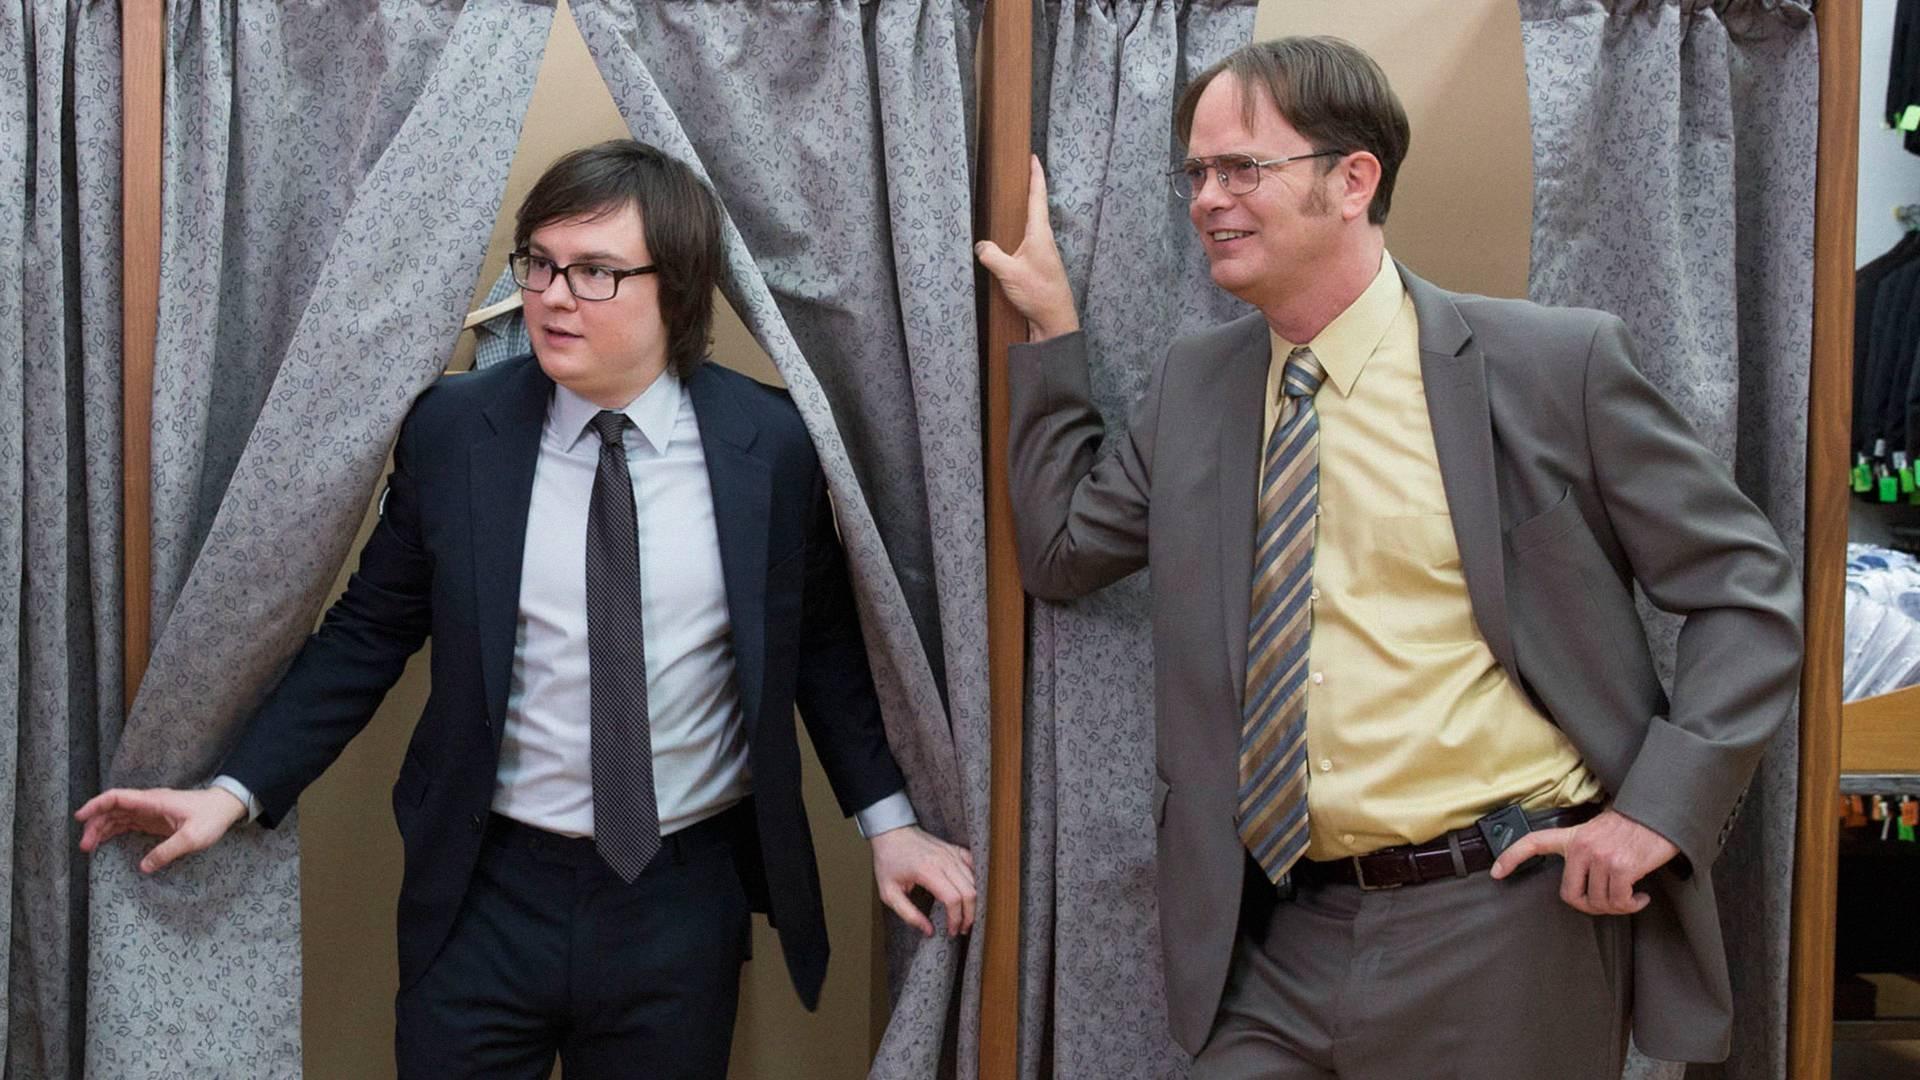 The Office Season 9 Episode 11